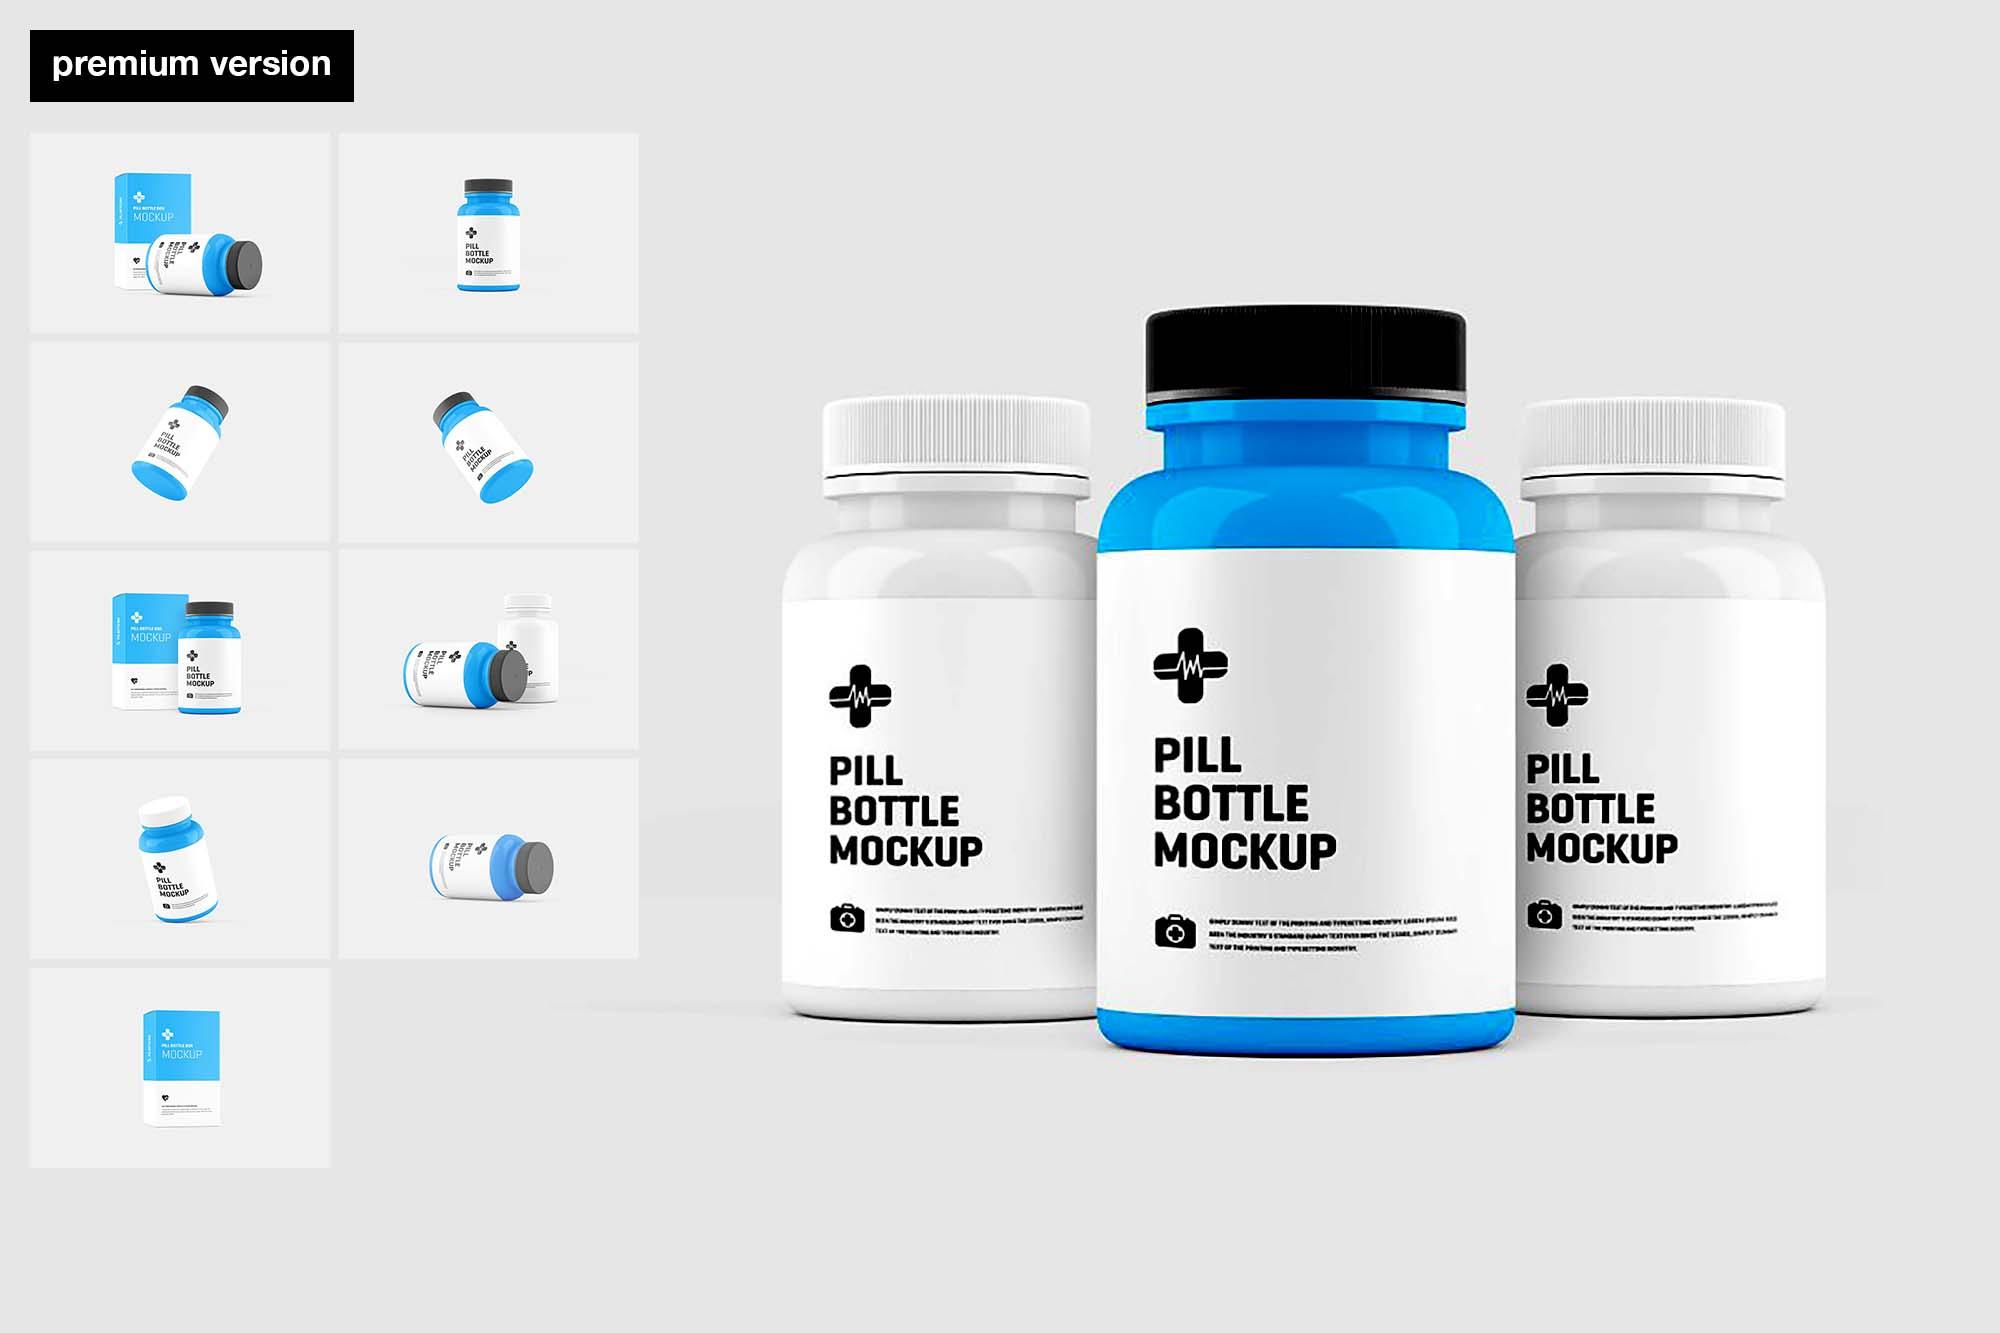 Pill Bottle Mockup - Premium Version